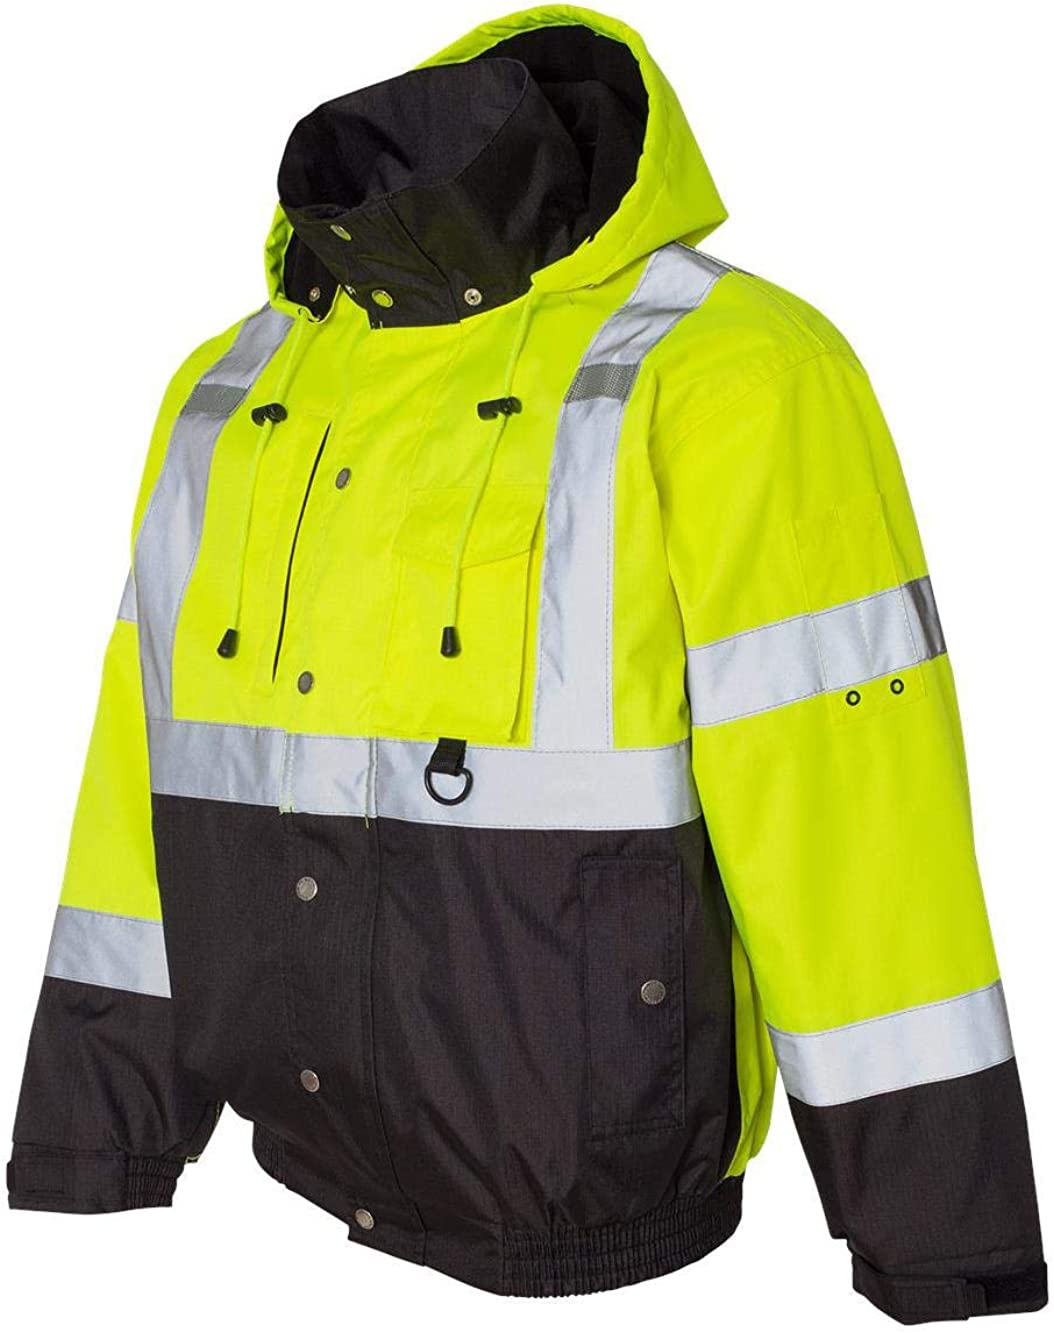 ML Kishigo Hi-Vis Jacket unisex shipfree Black Lime 4XL